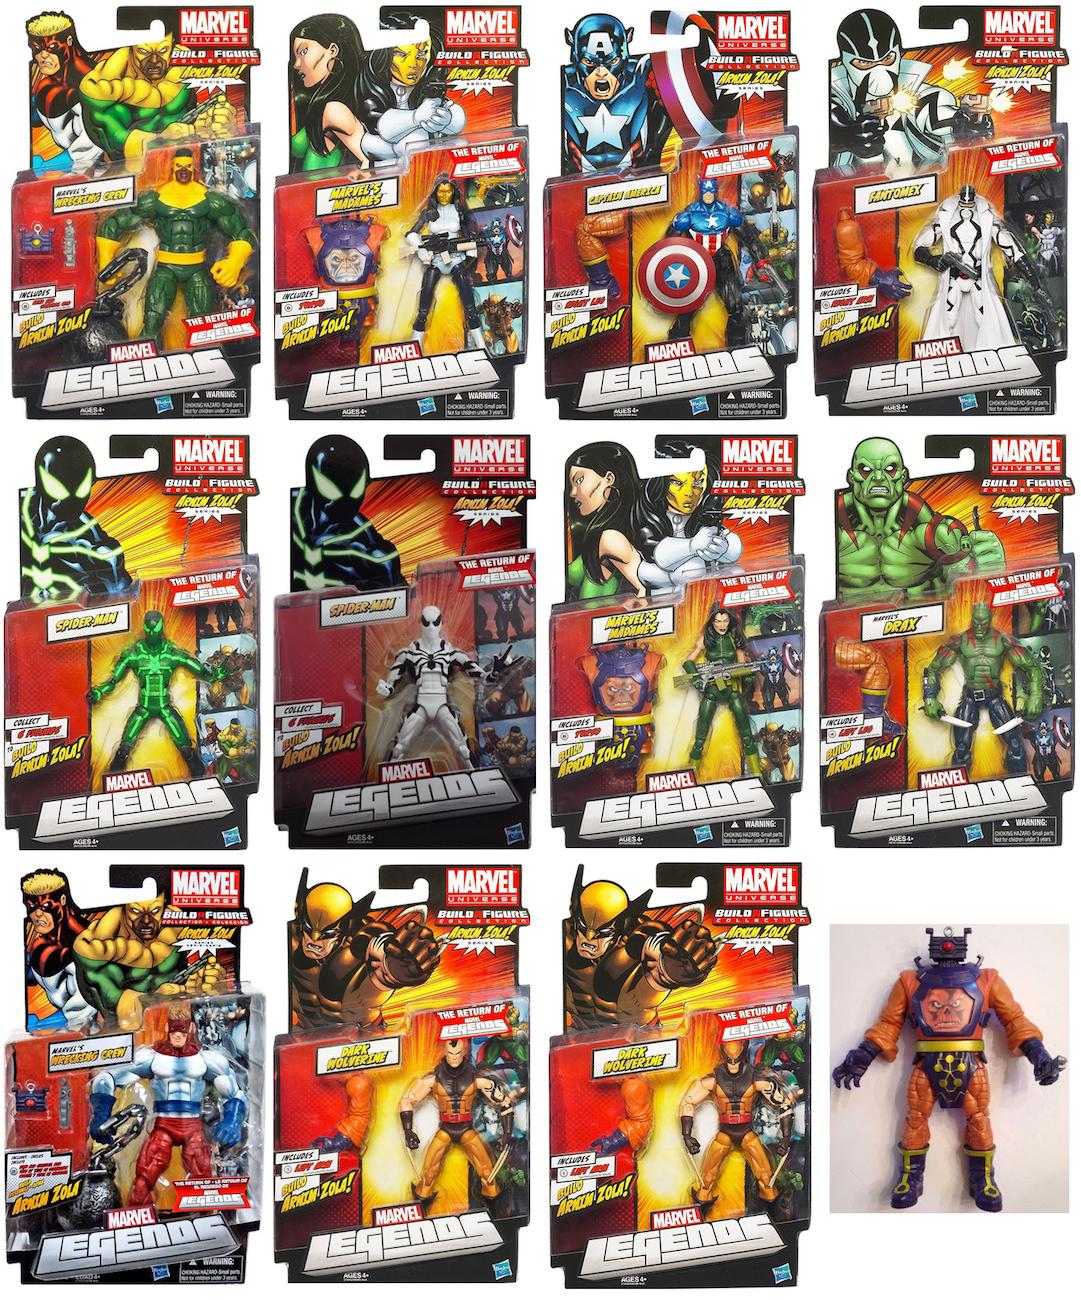 Marvel Legends Arnim Zola Series Madame Viper Action Figure Green Suit Variant